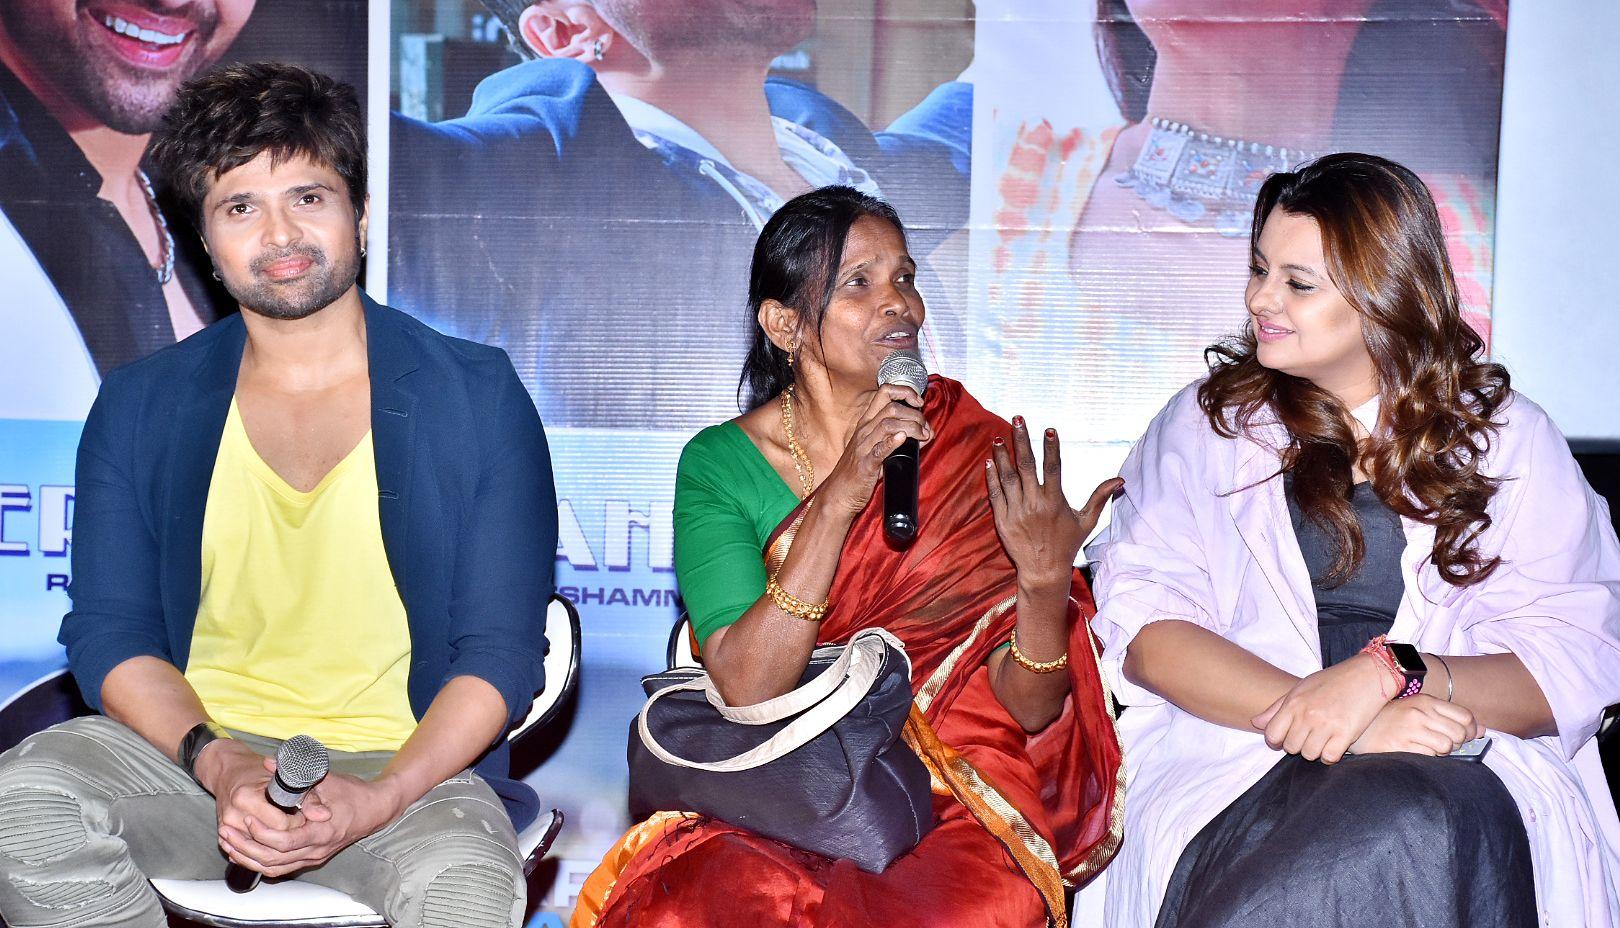 Himesh Reshammiya Opens Up On Lata Mangeshkar's Views On Ranu Mondal